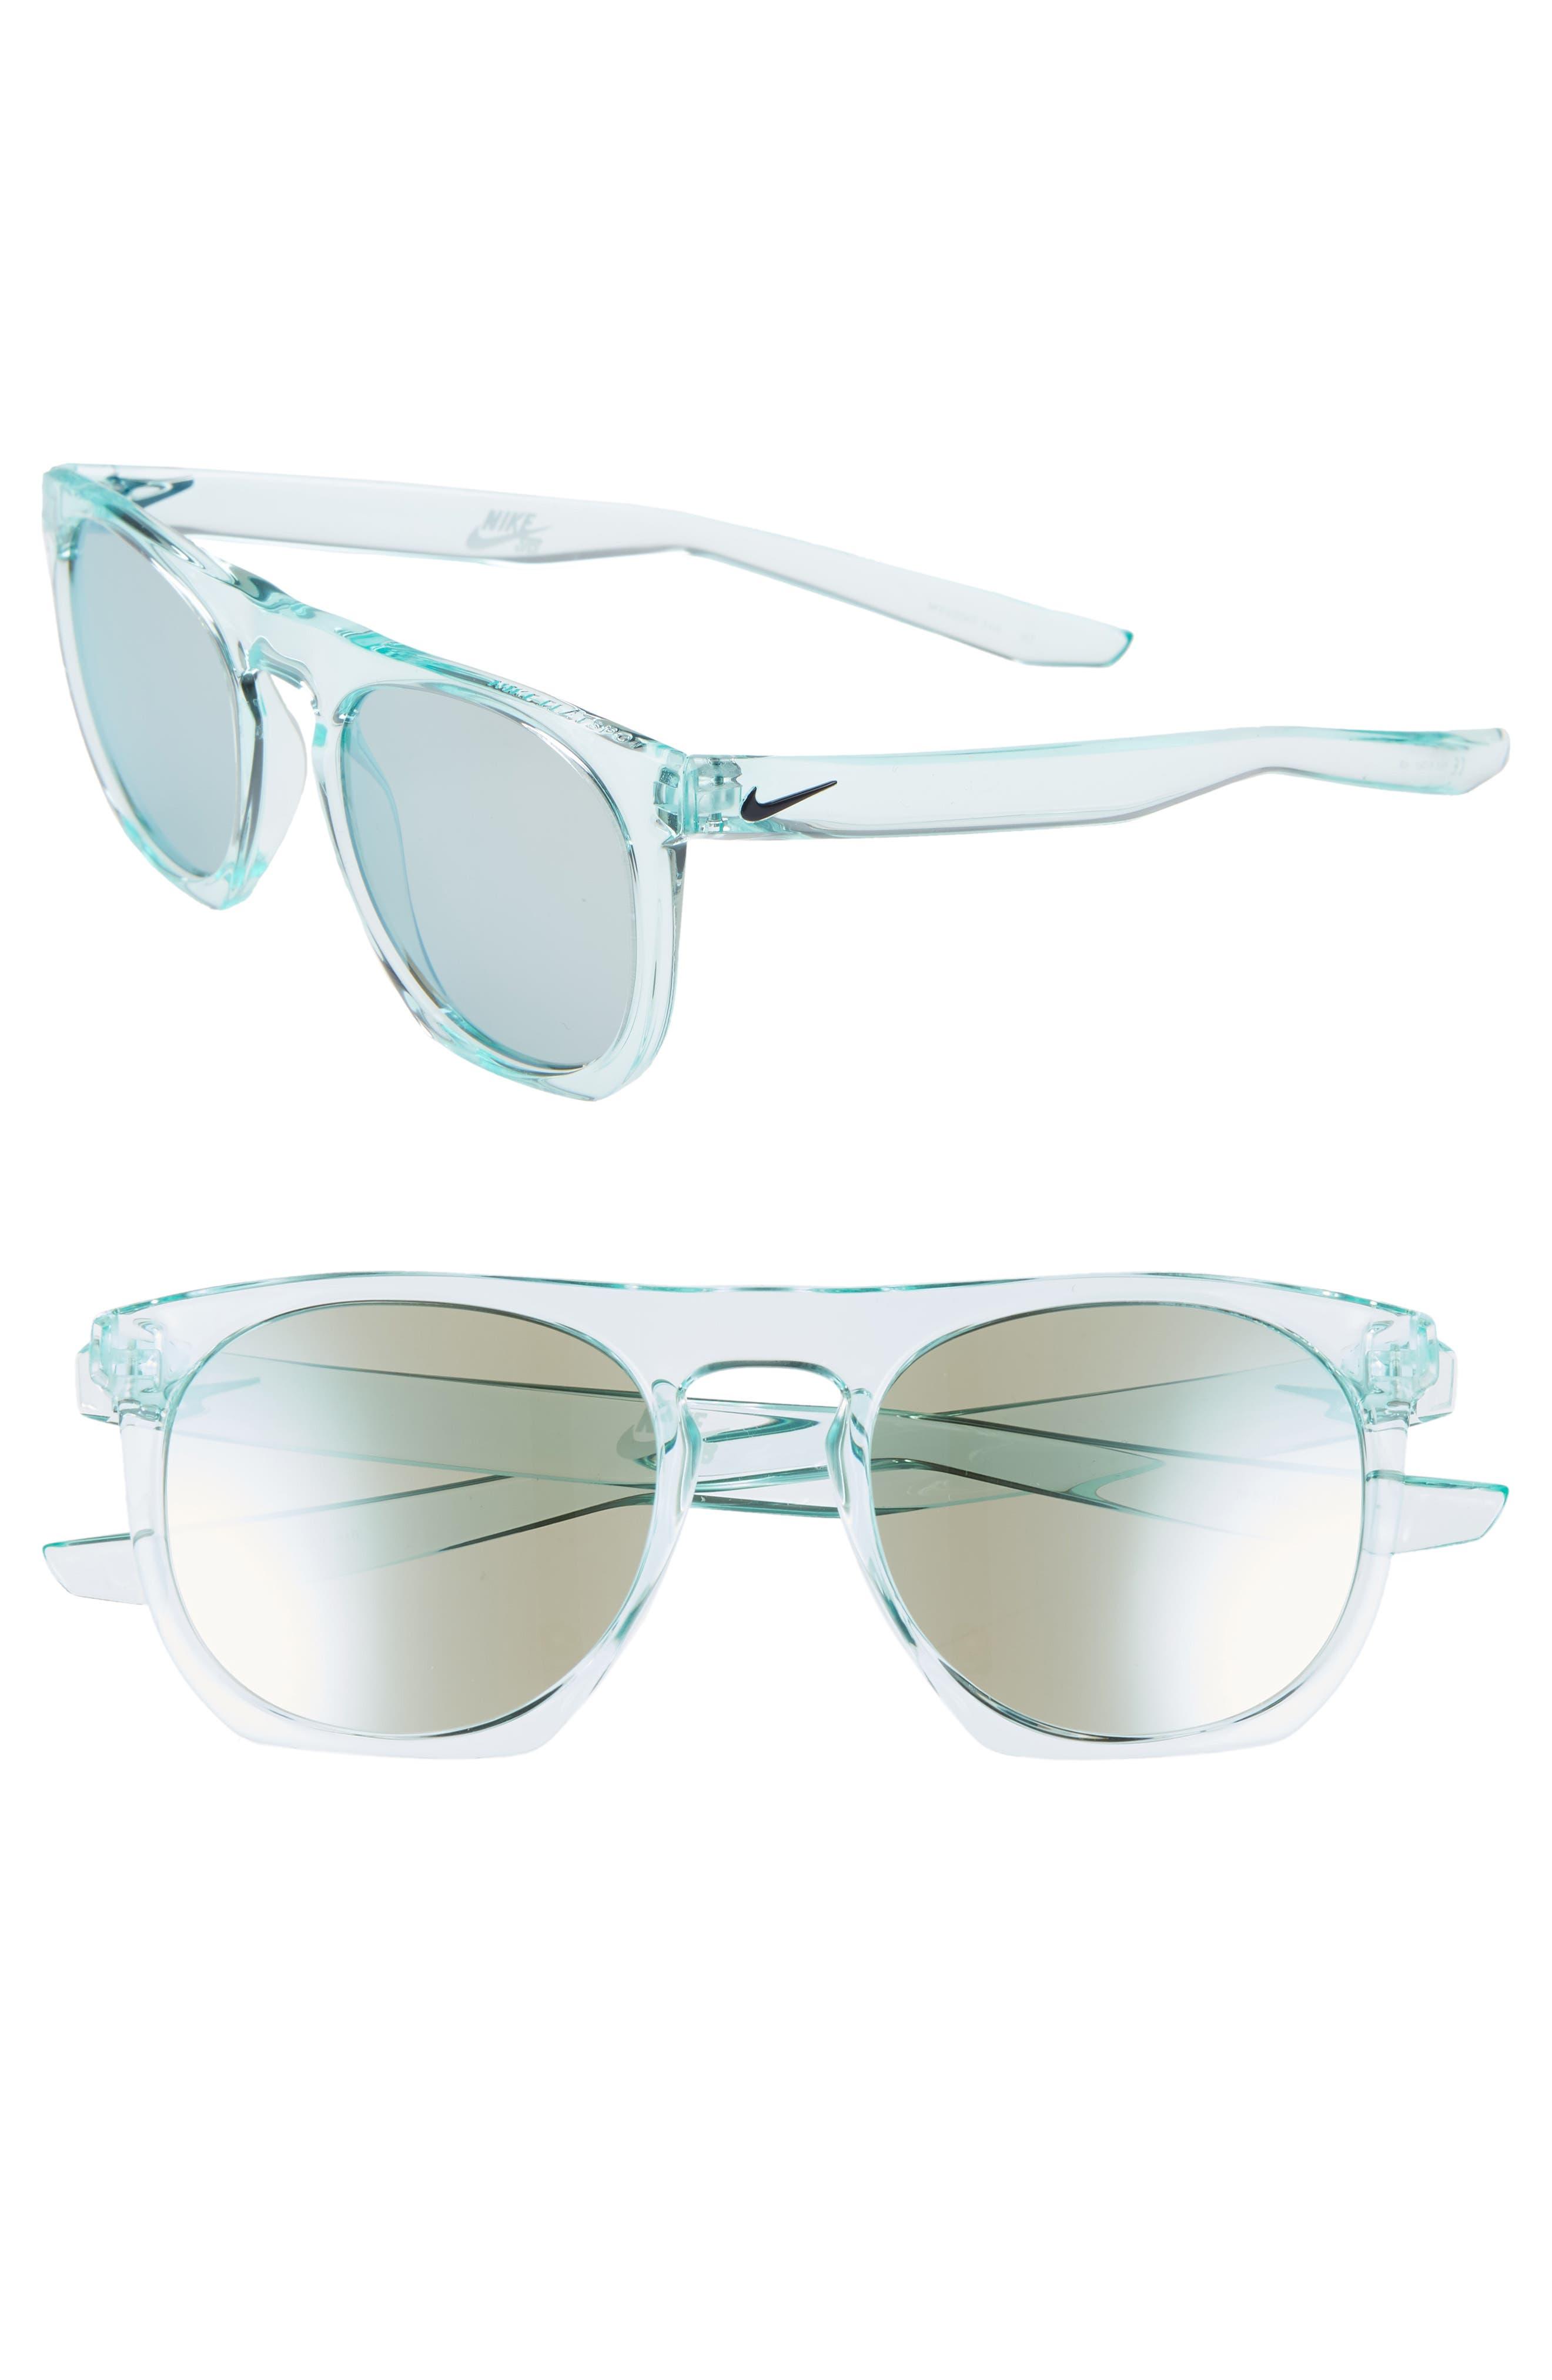 Nike Flatspot 52Mm Mirrored Sunglasses - Igloo/ Blue